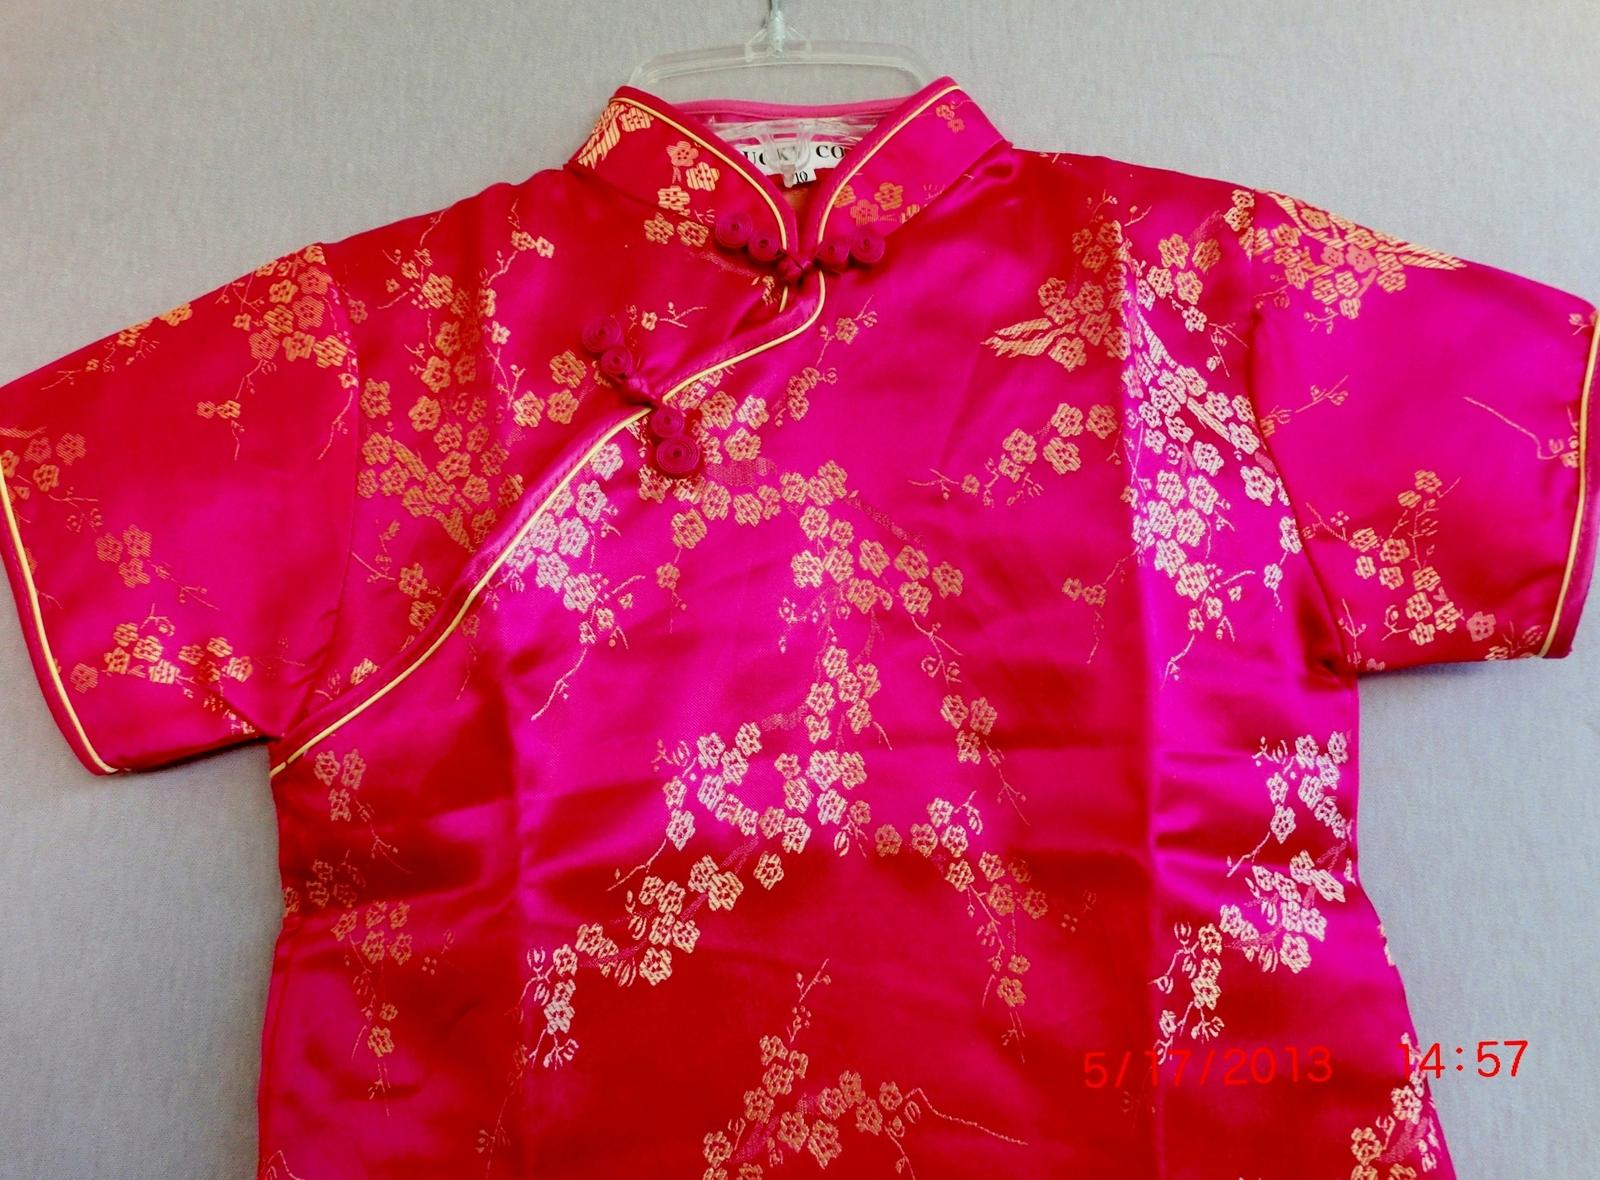 Chinese satin silk rose pink silver detail flowers girls cheong-sam dress sz 10